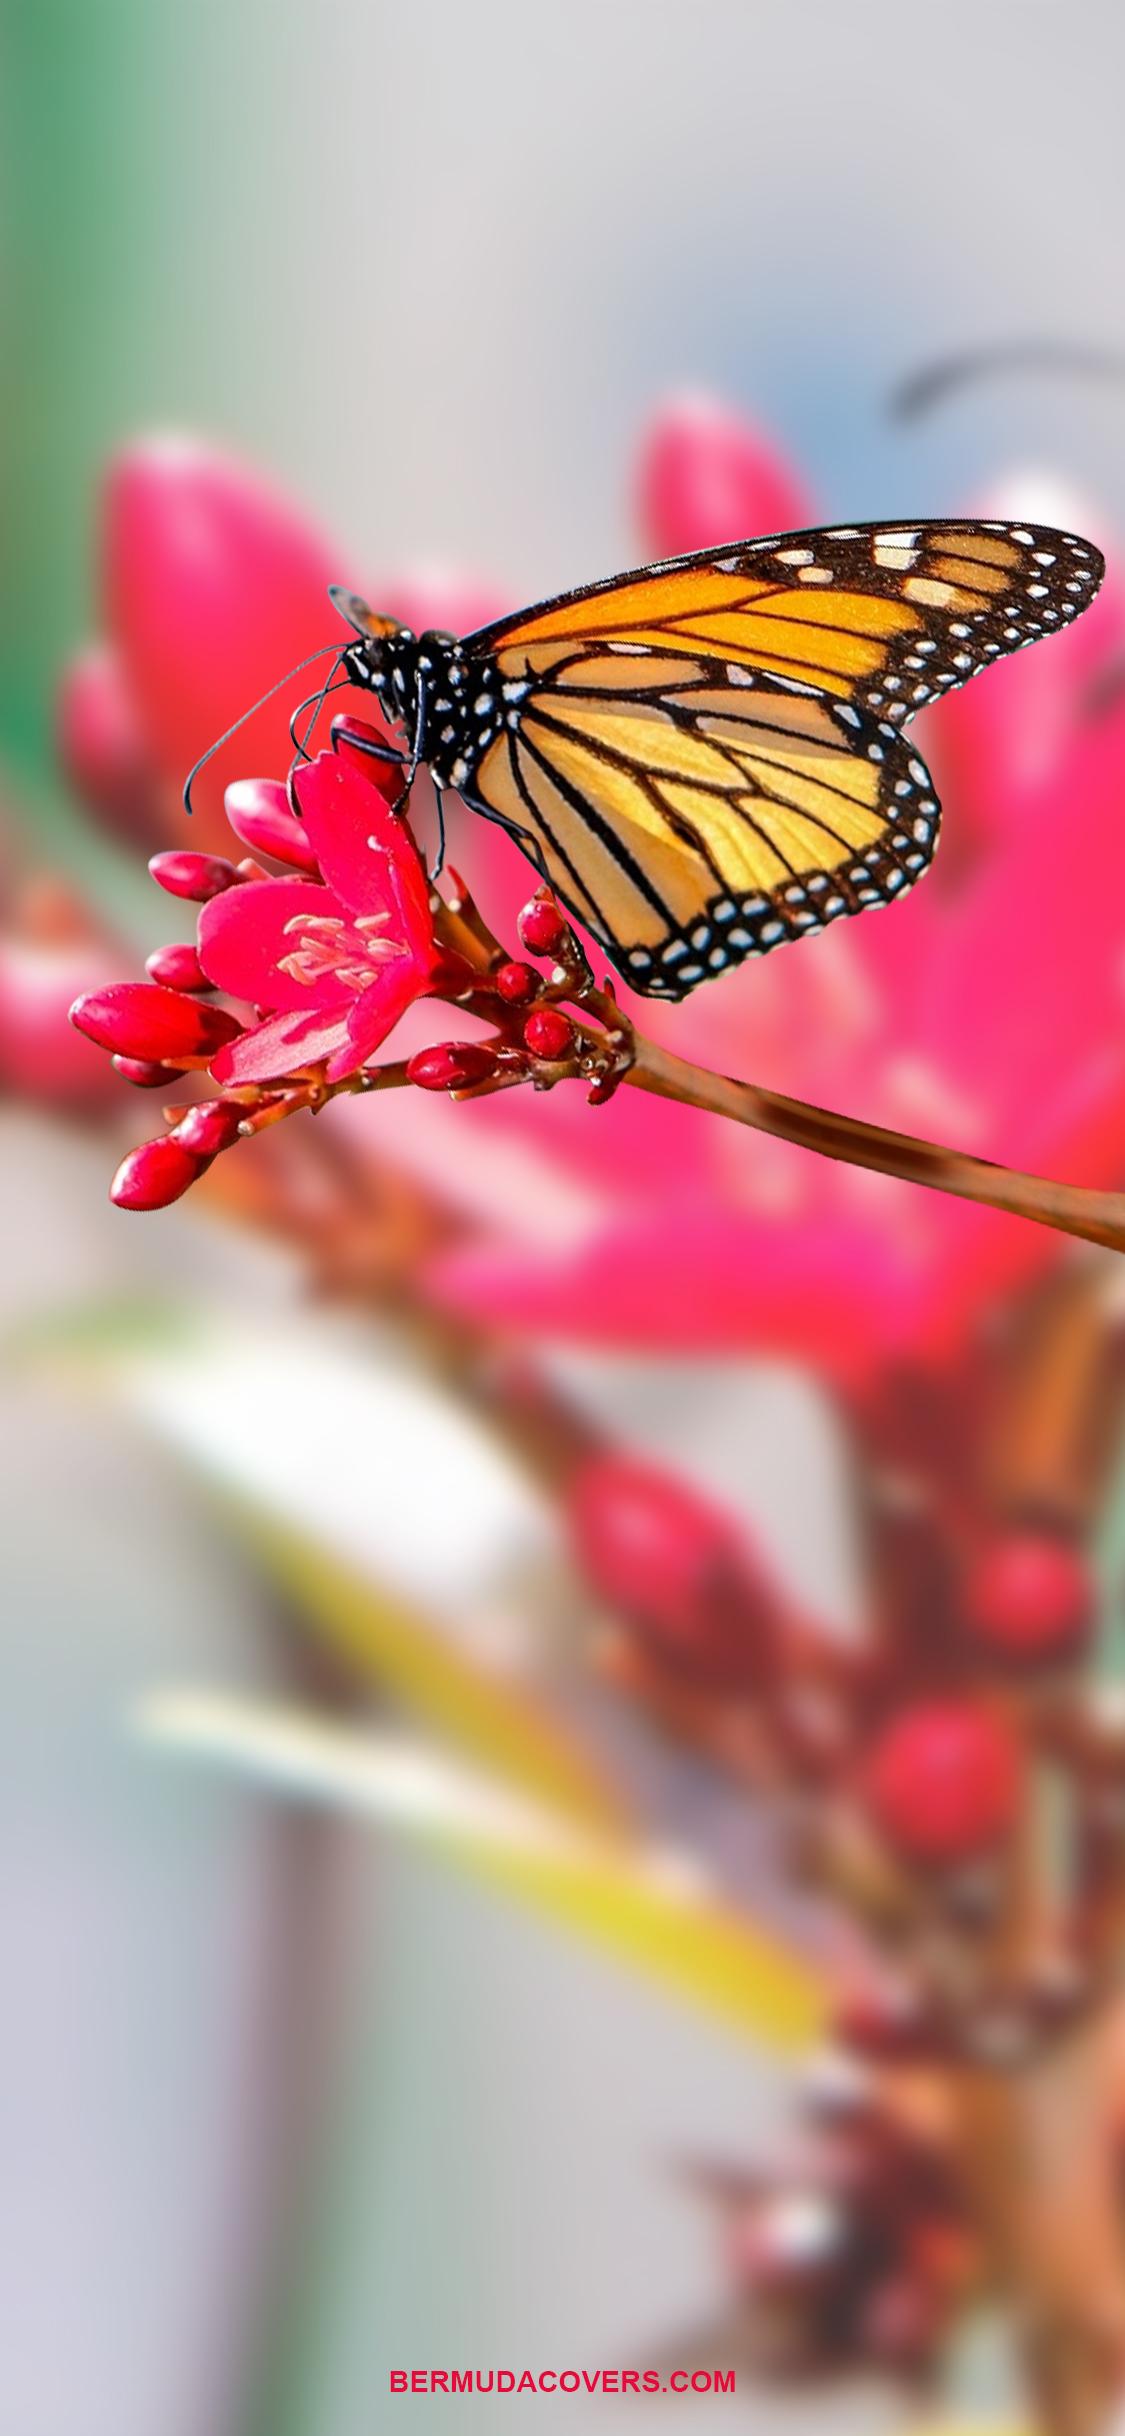 Bermuda Butterfly On Flower by Bernews Mobile phone wallpaper lock screen design image photo YyDNzgkM